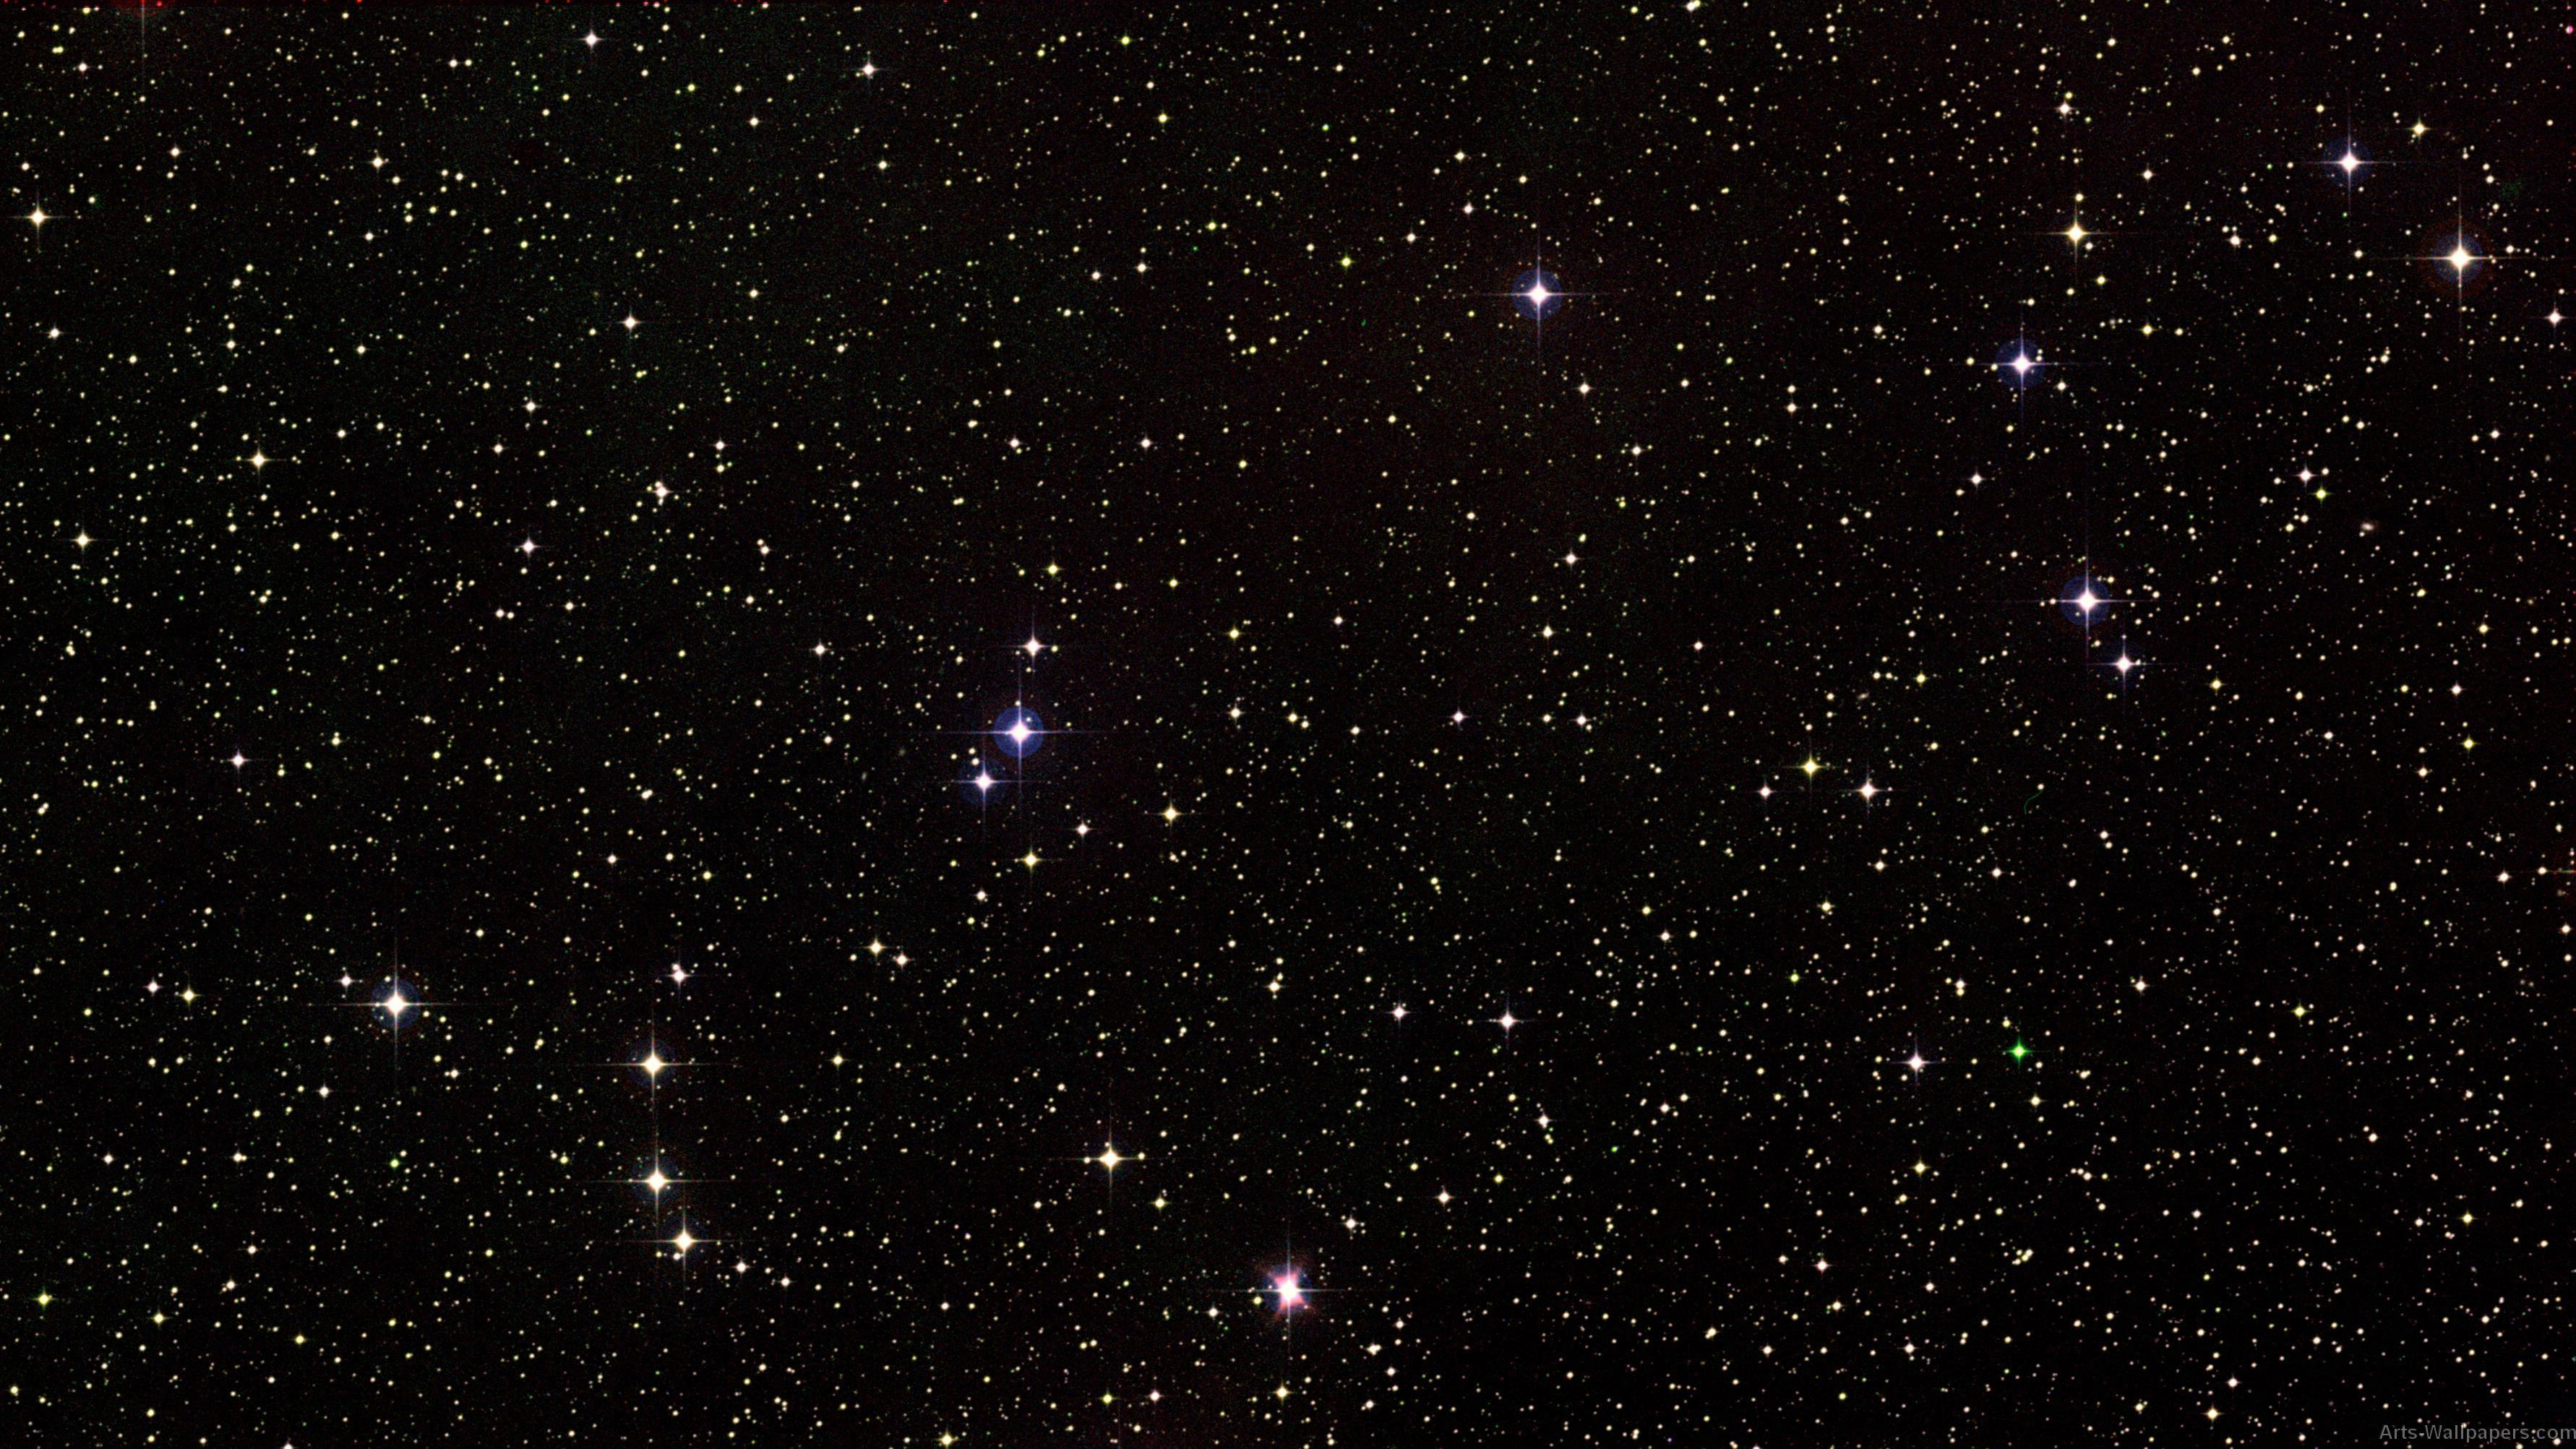 Space Star Background - WallpaperSafari Stars